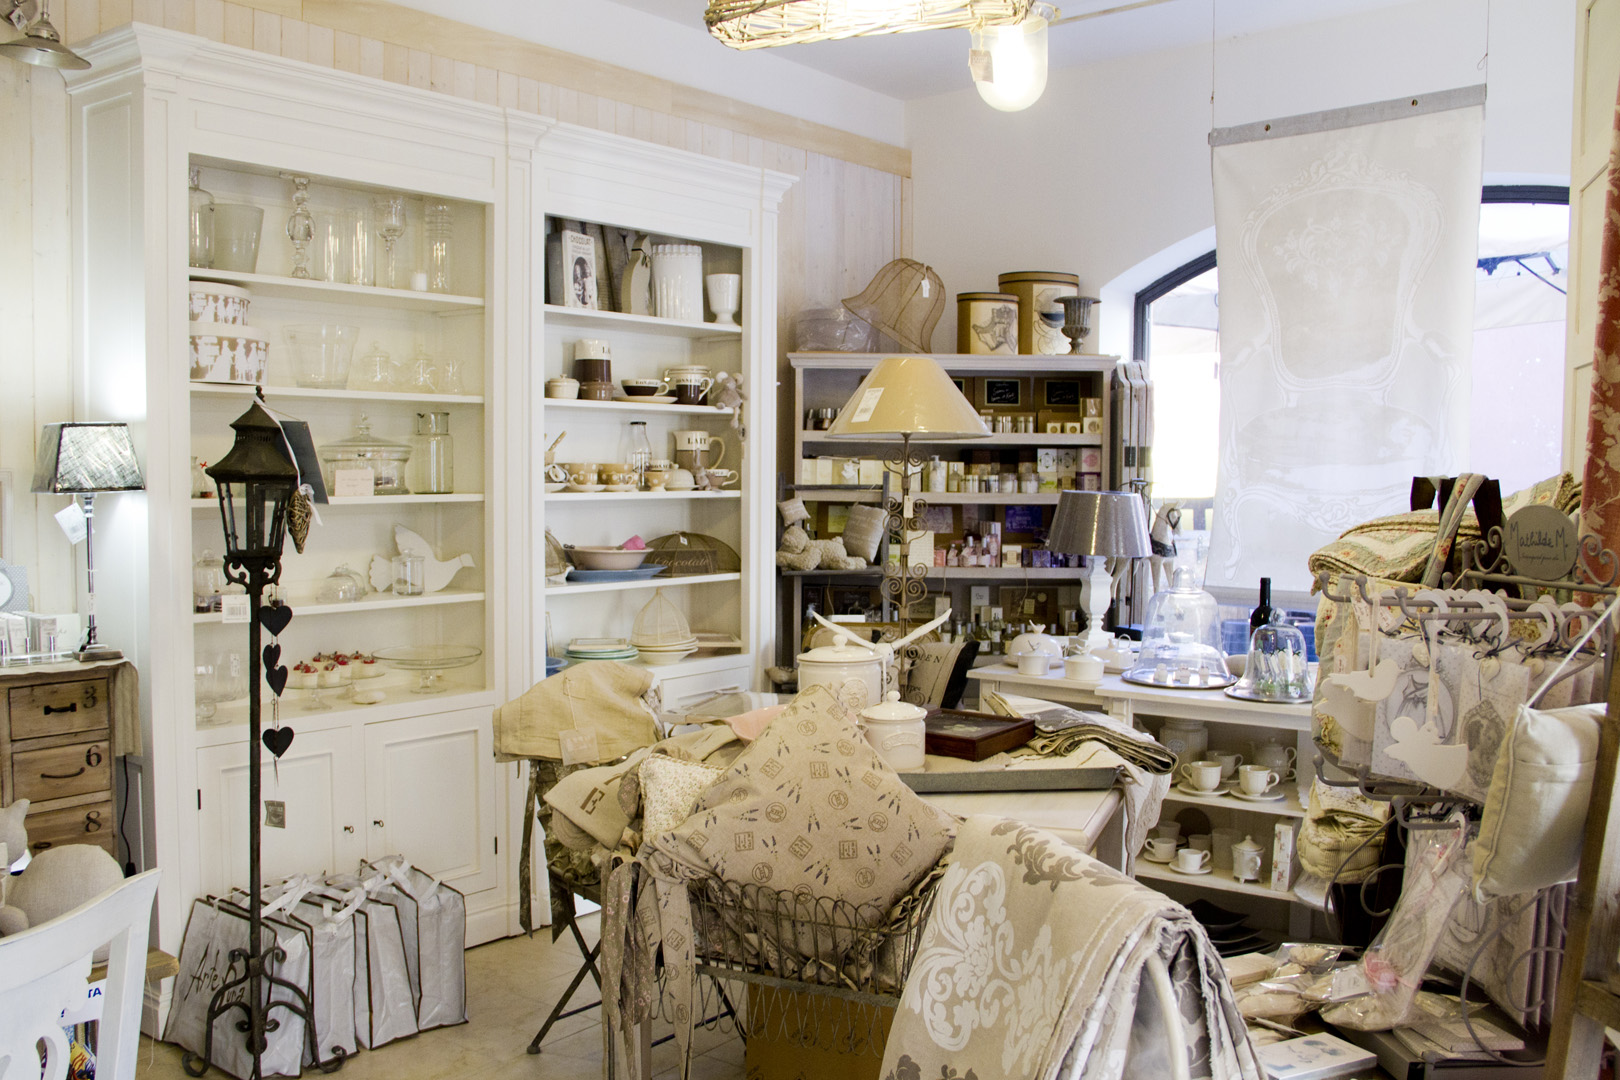 Arredo arredamento provenzale stile country 5 for Arredo shop online